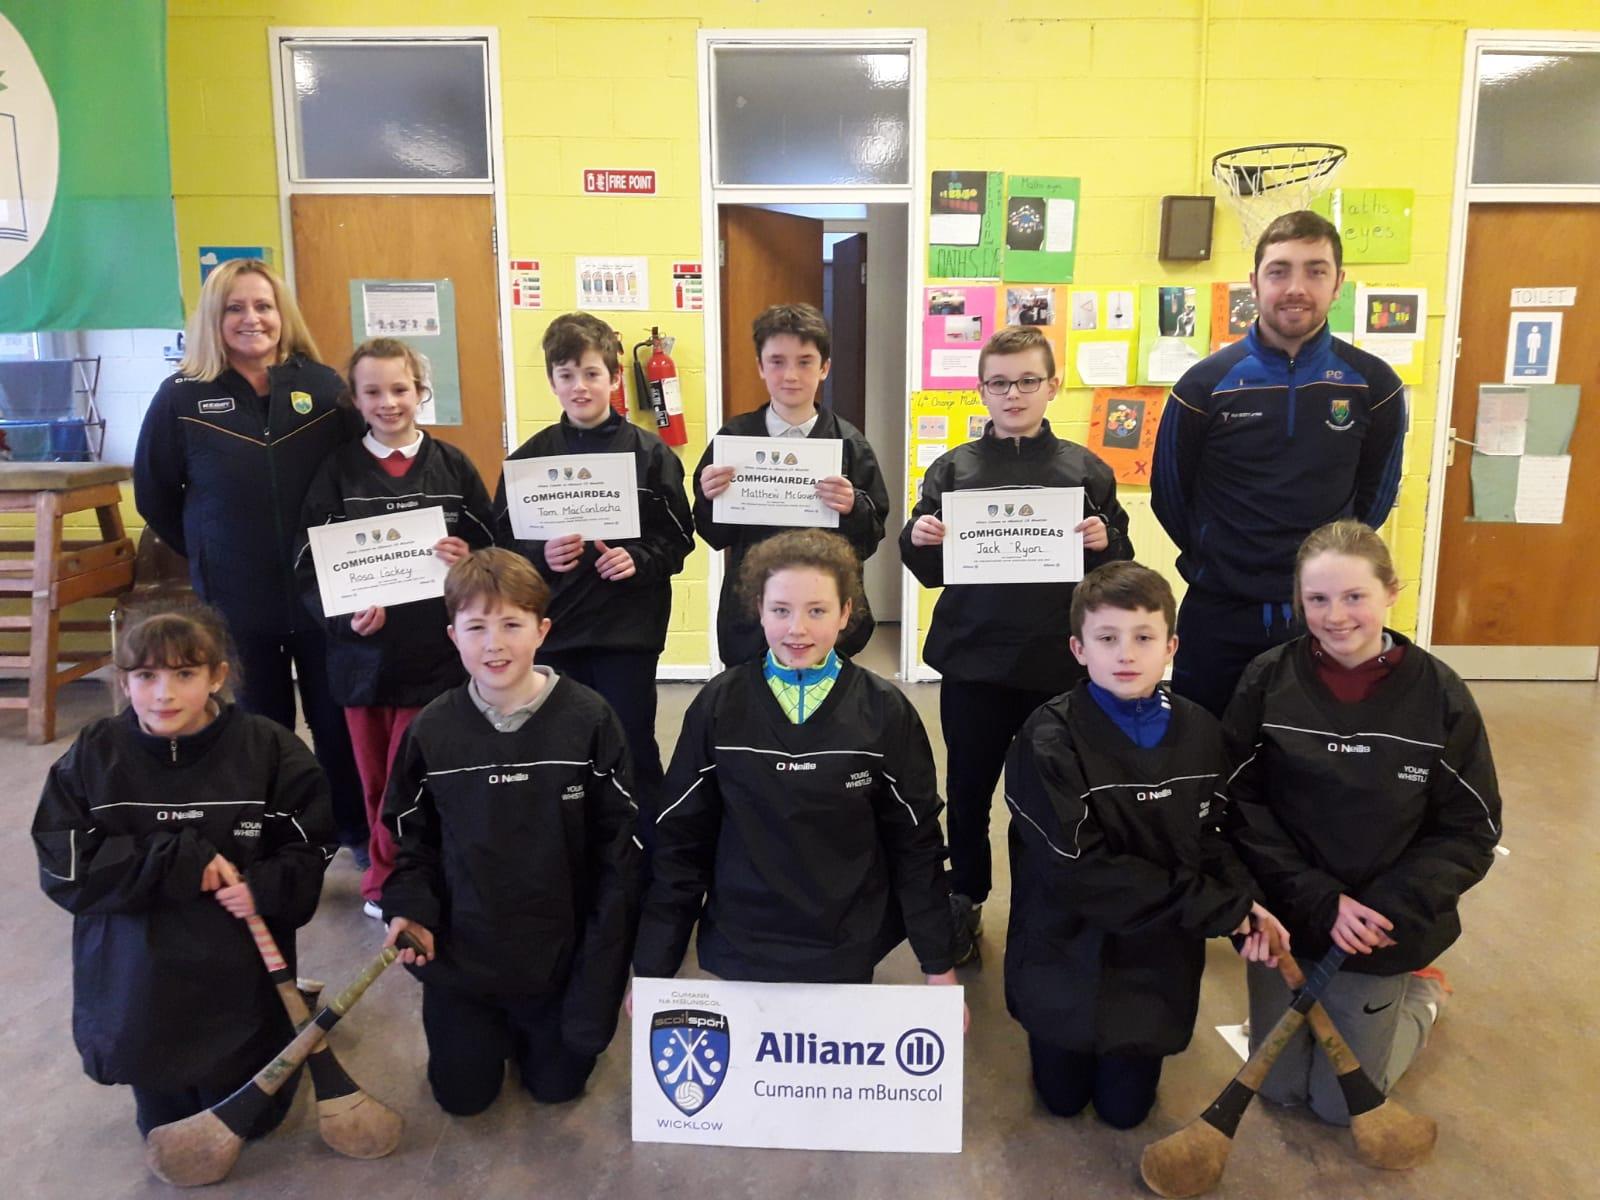 Allianz Cumann na mBunscol Chill Mhantáin 10/02/19